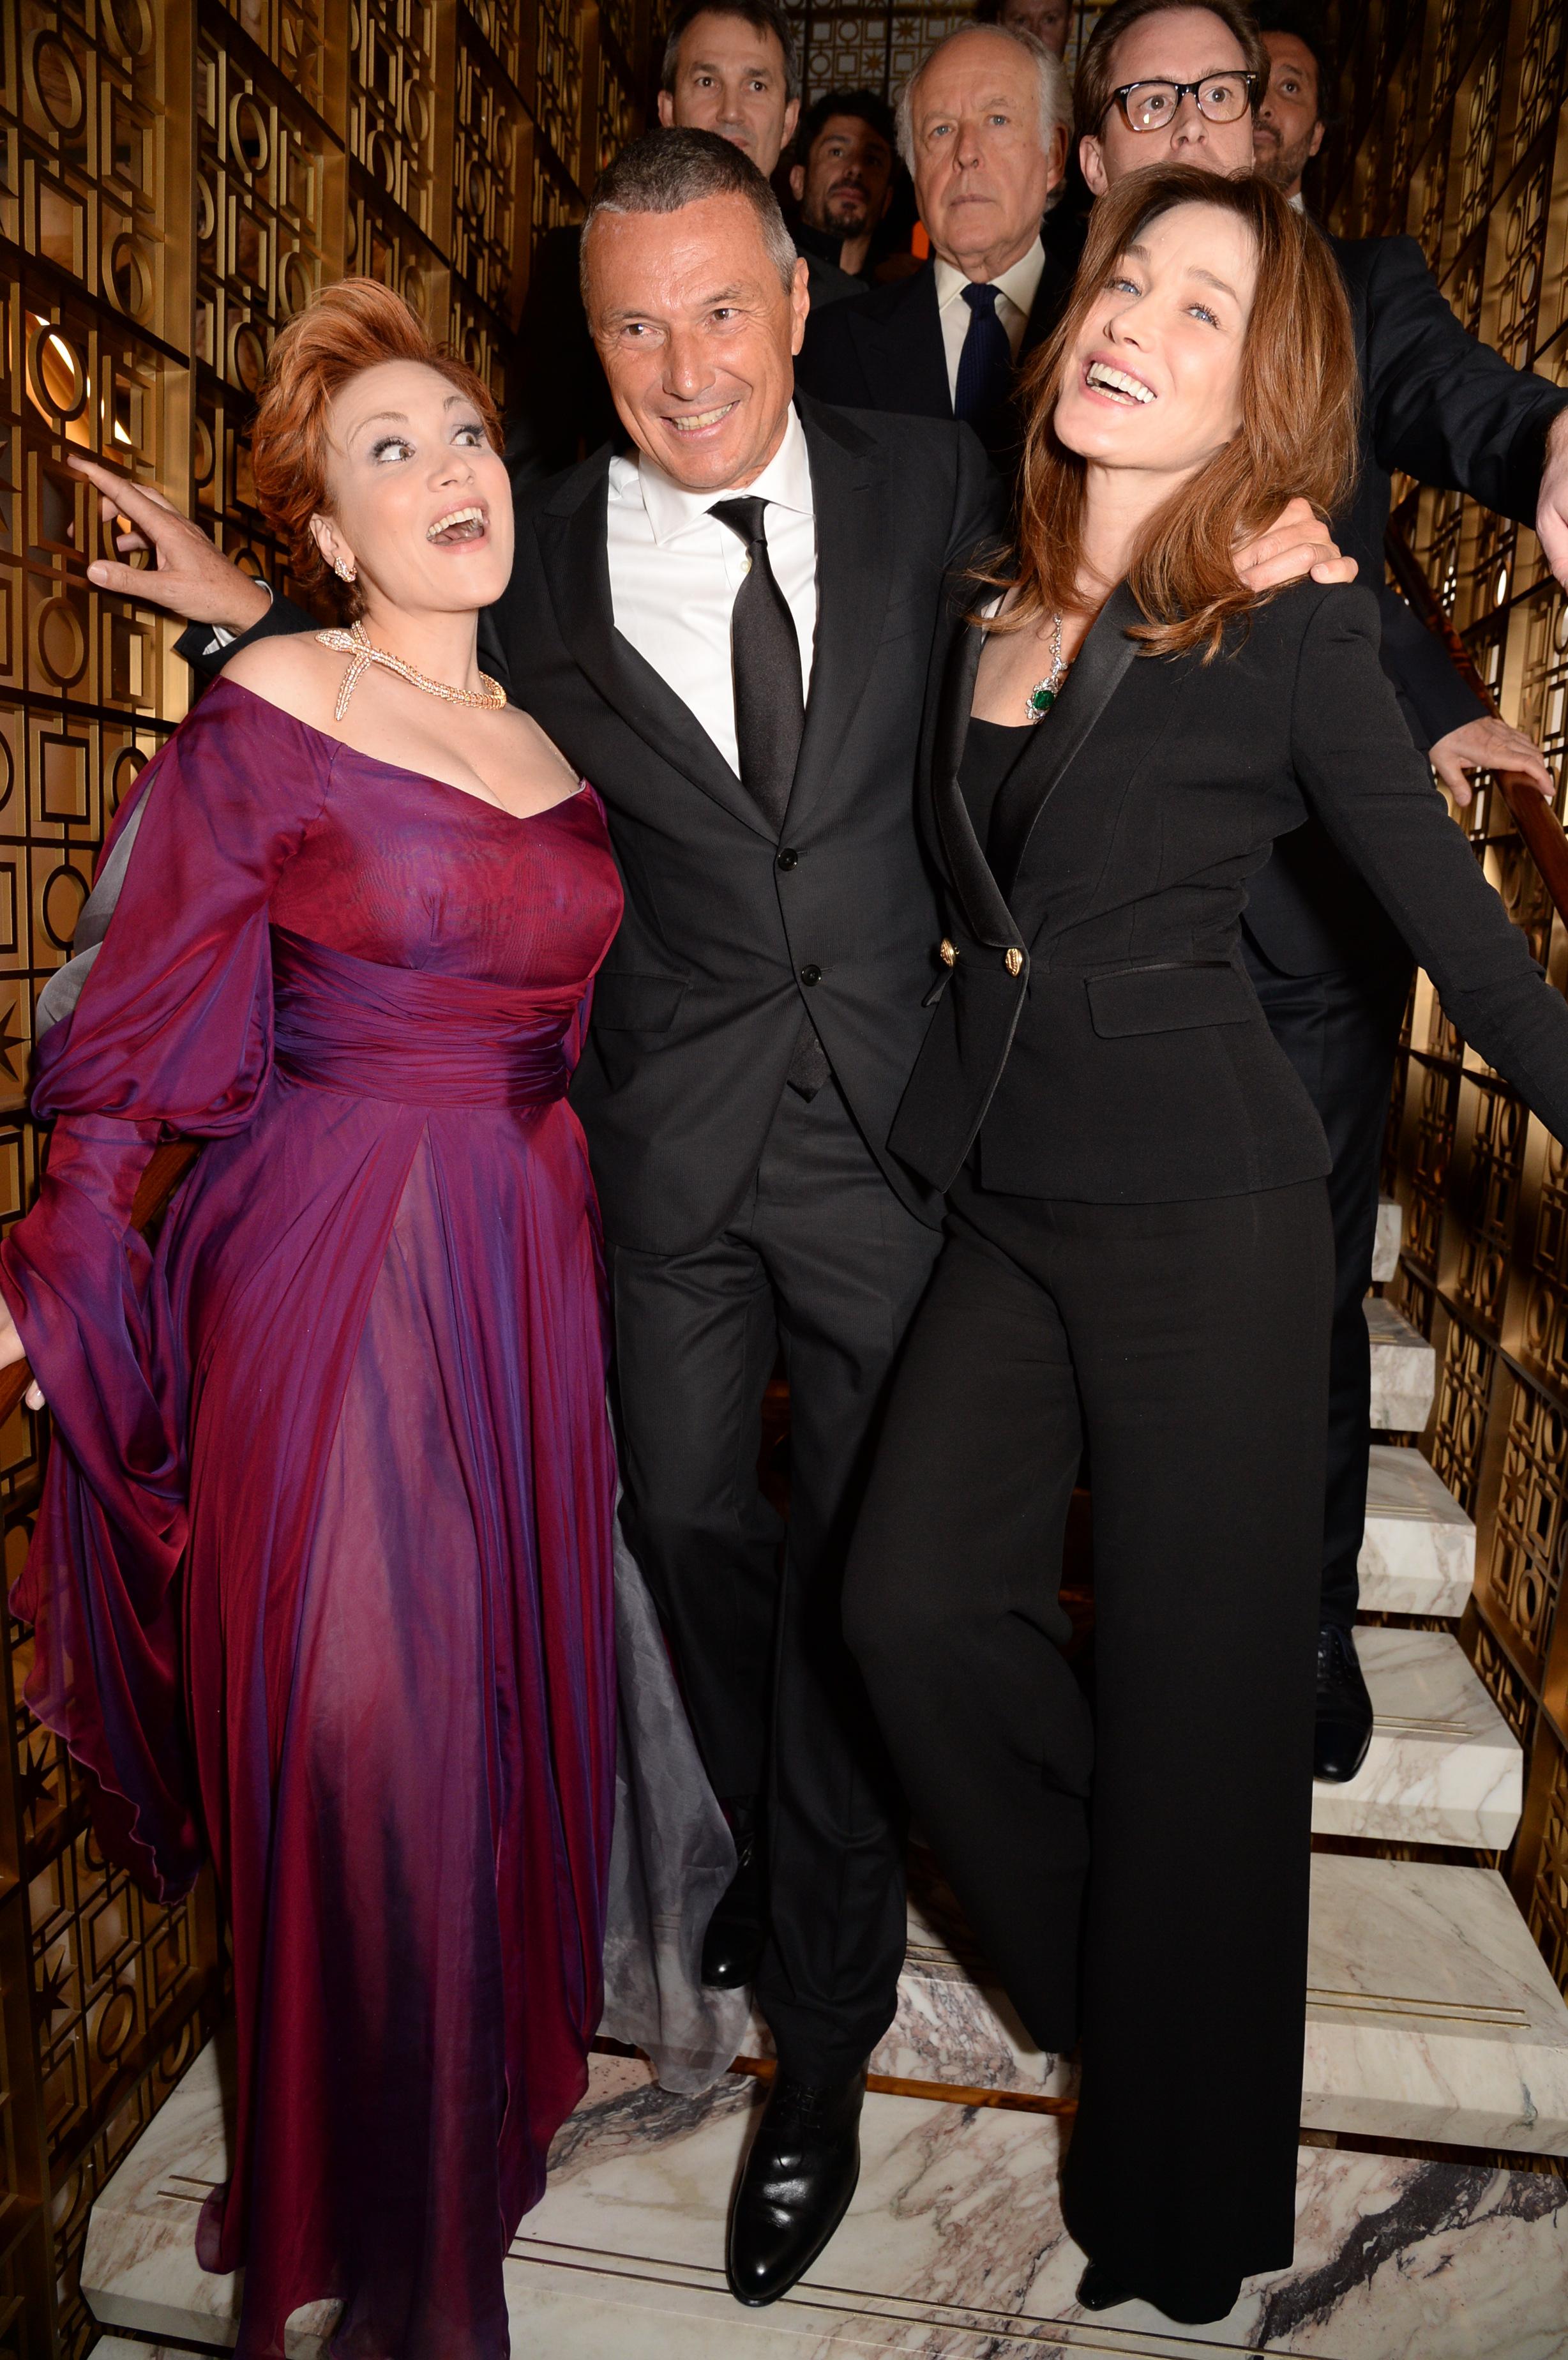 Carla Bruni-Sarkozy, Jean-Christophe Babin and Carmen Giannattasio